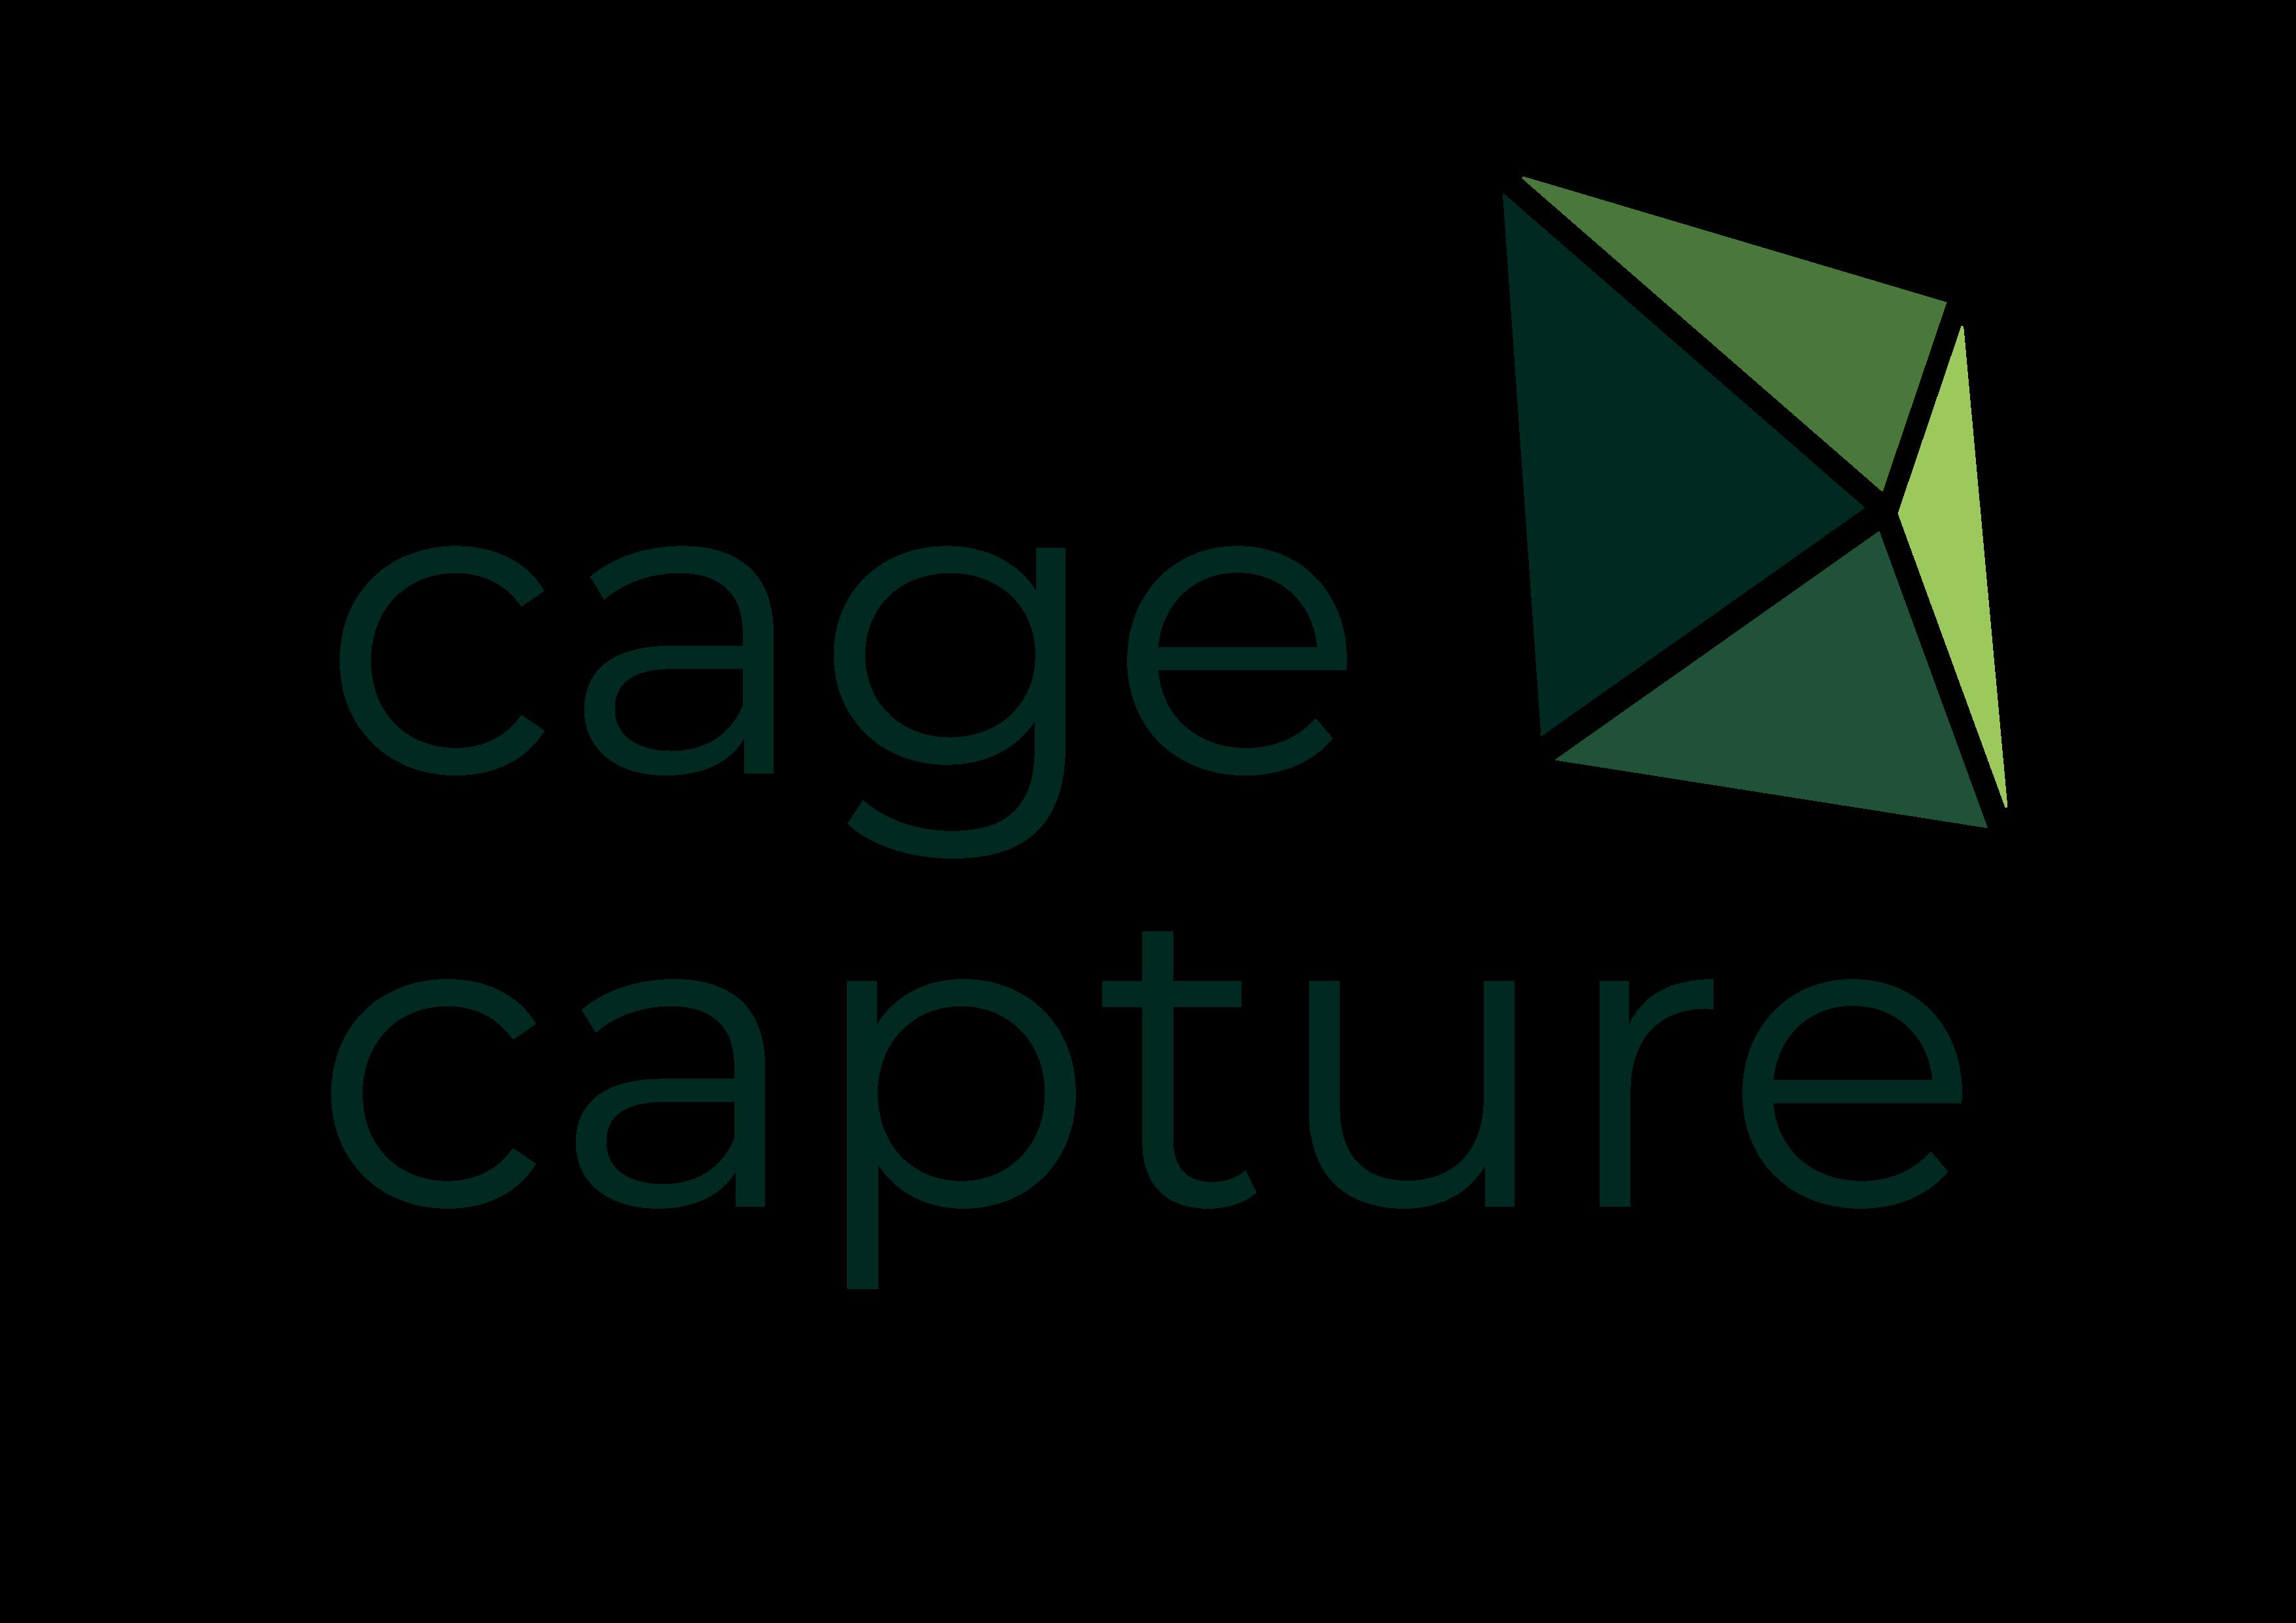 CageCapture